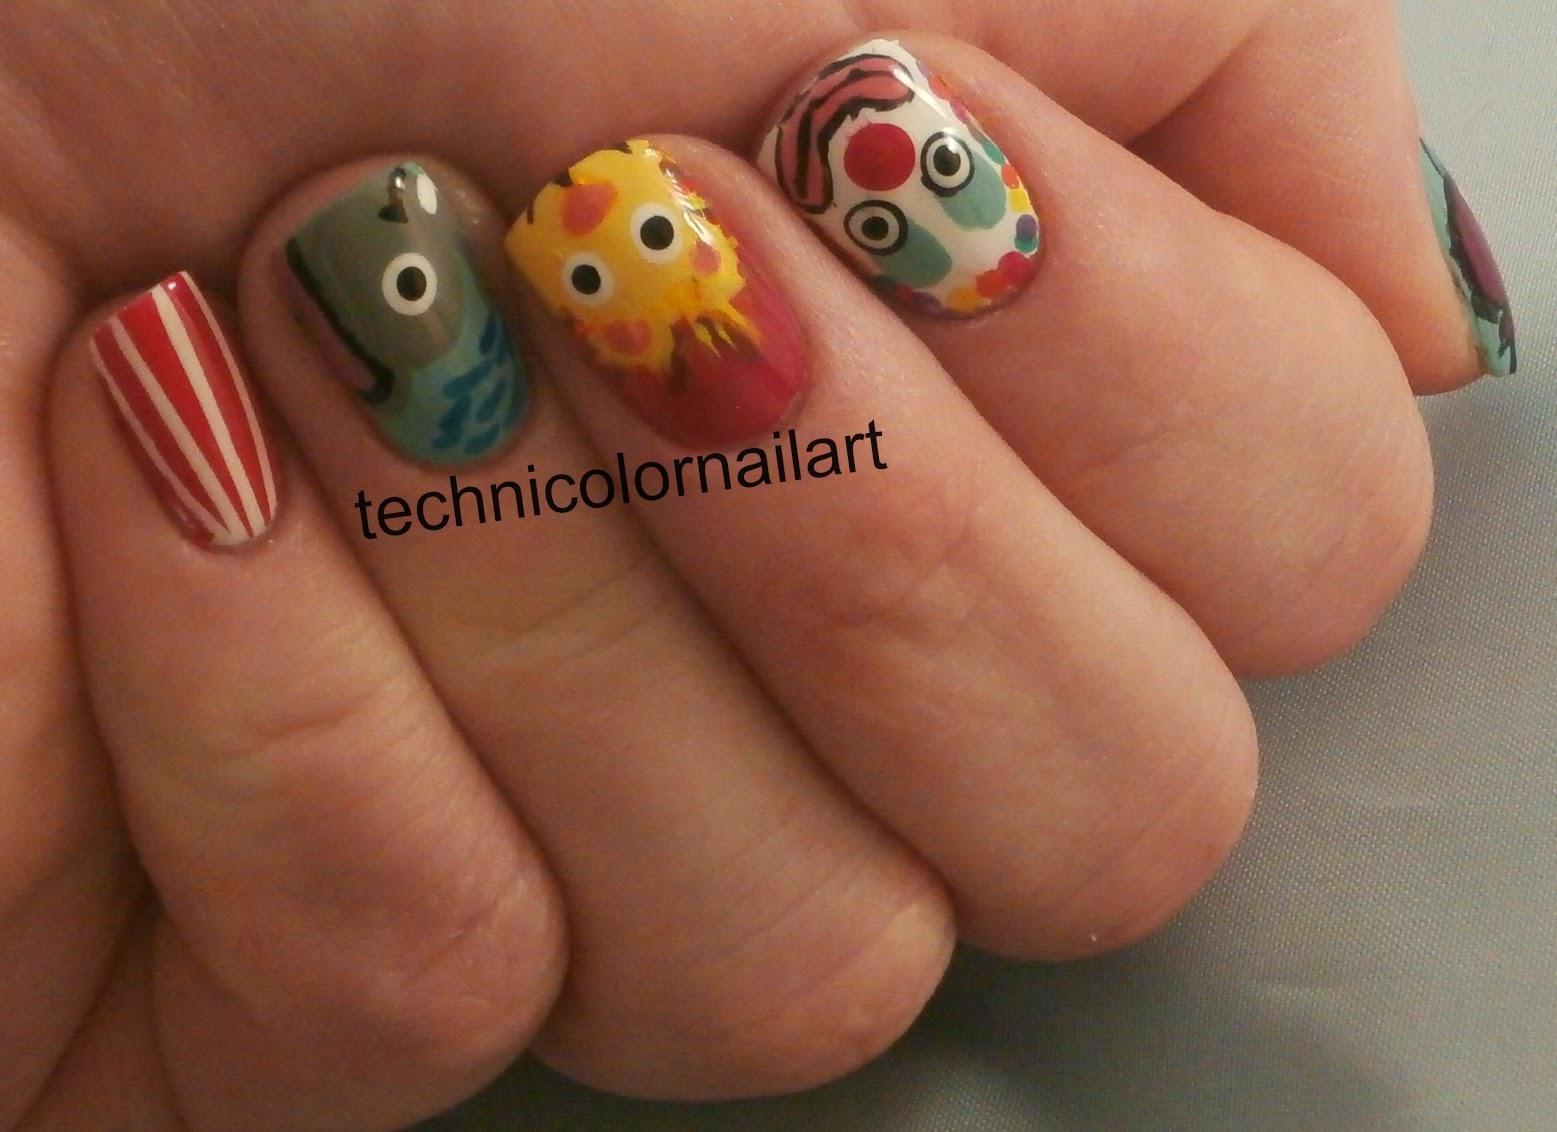 Technicolor Nail Art: Challenge Your Nail Art: Circus